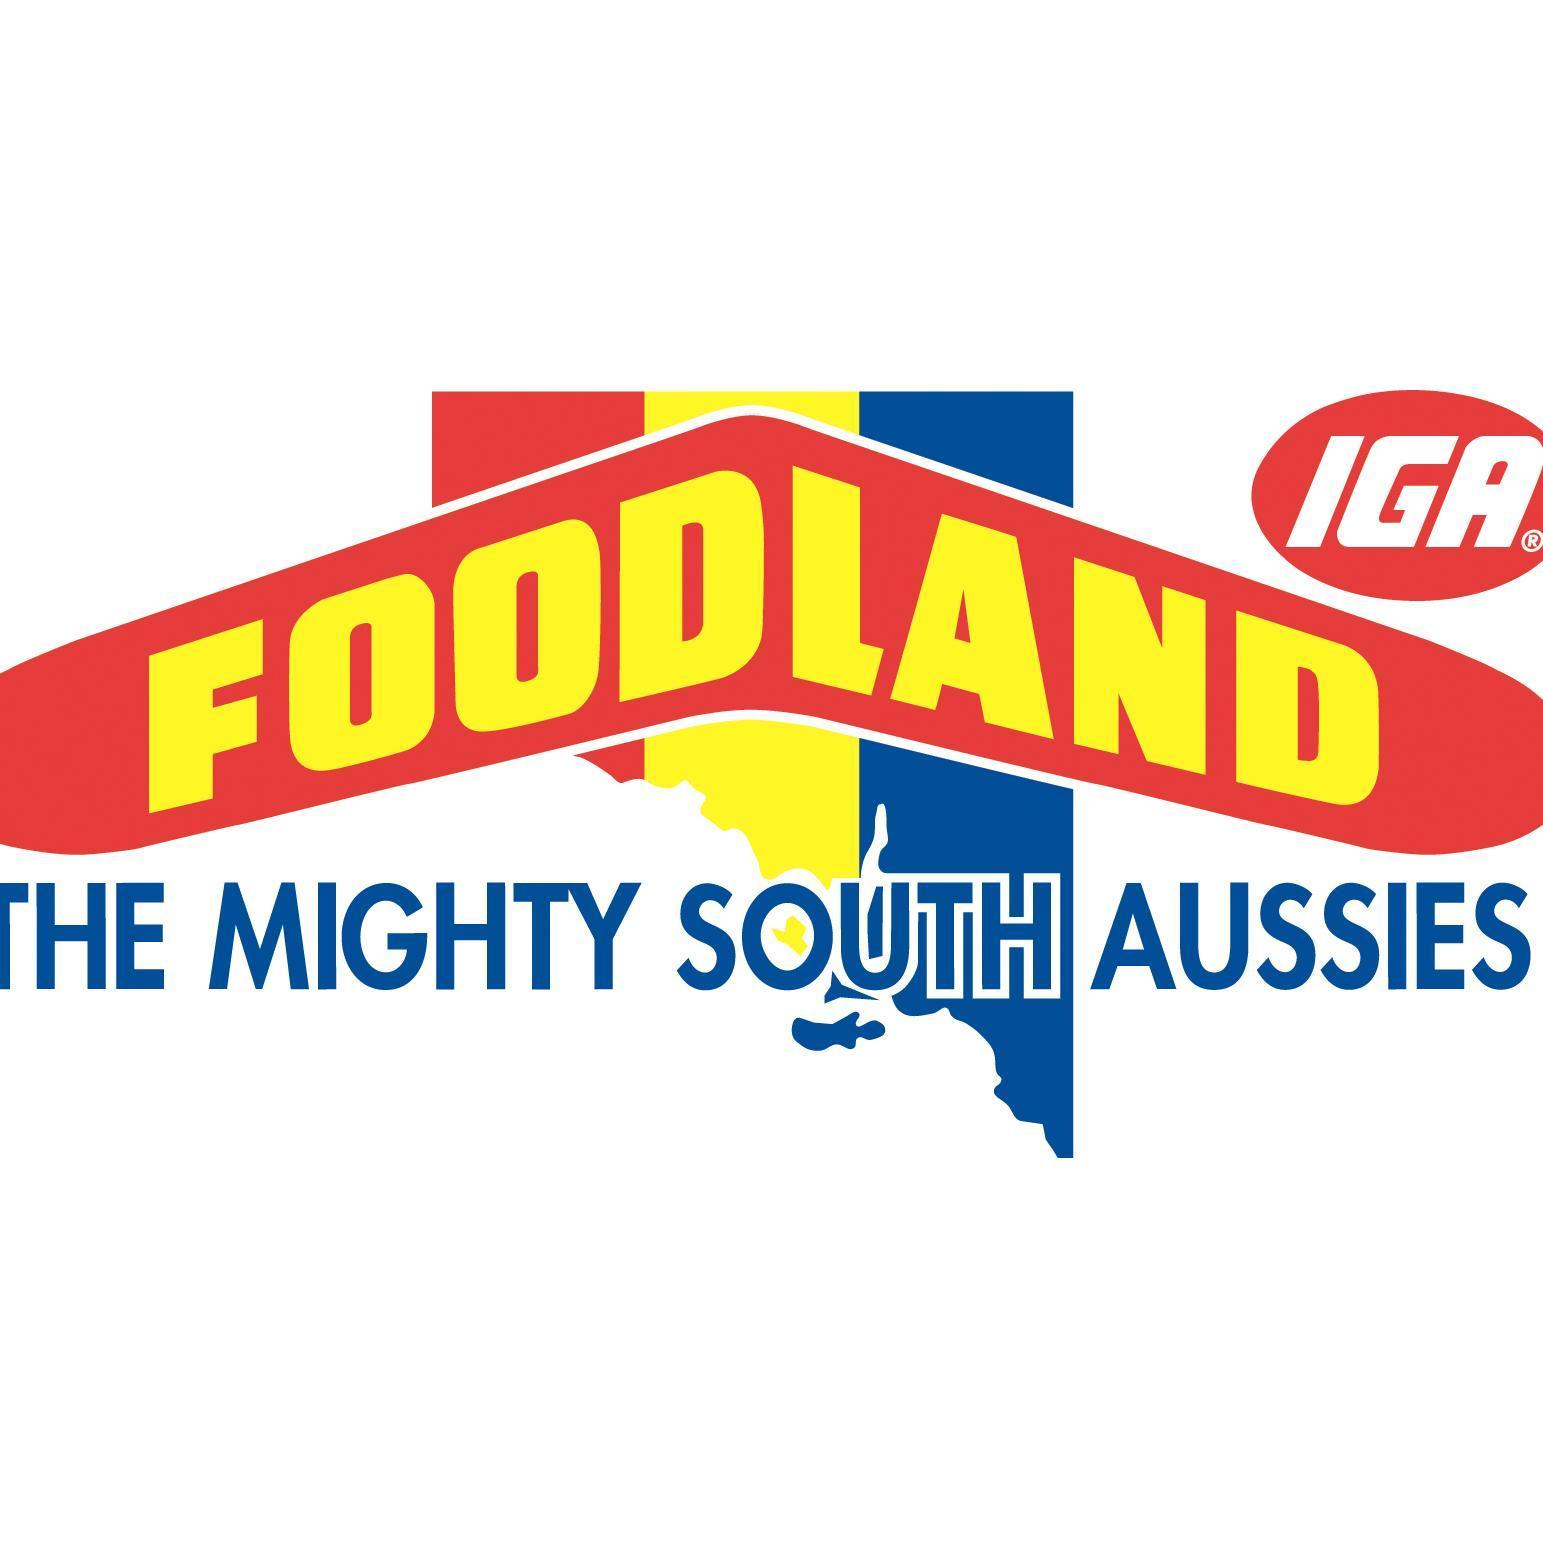 @FoodlandSA